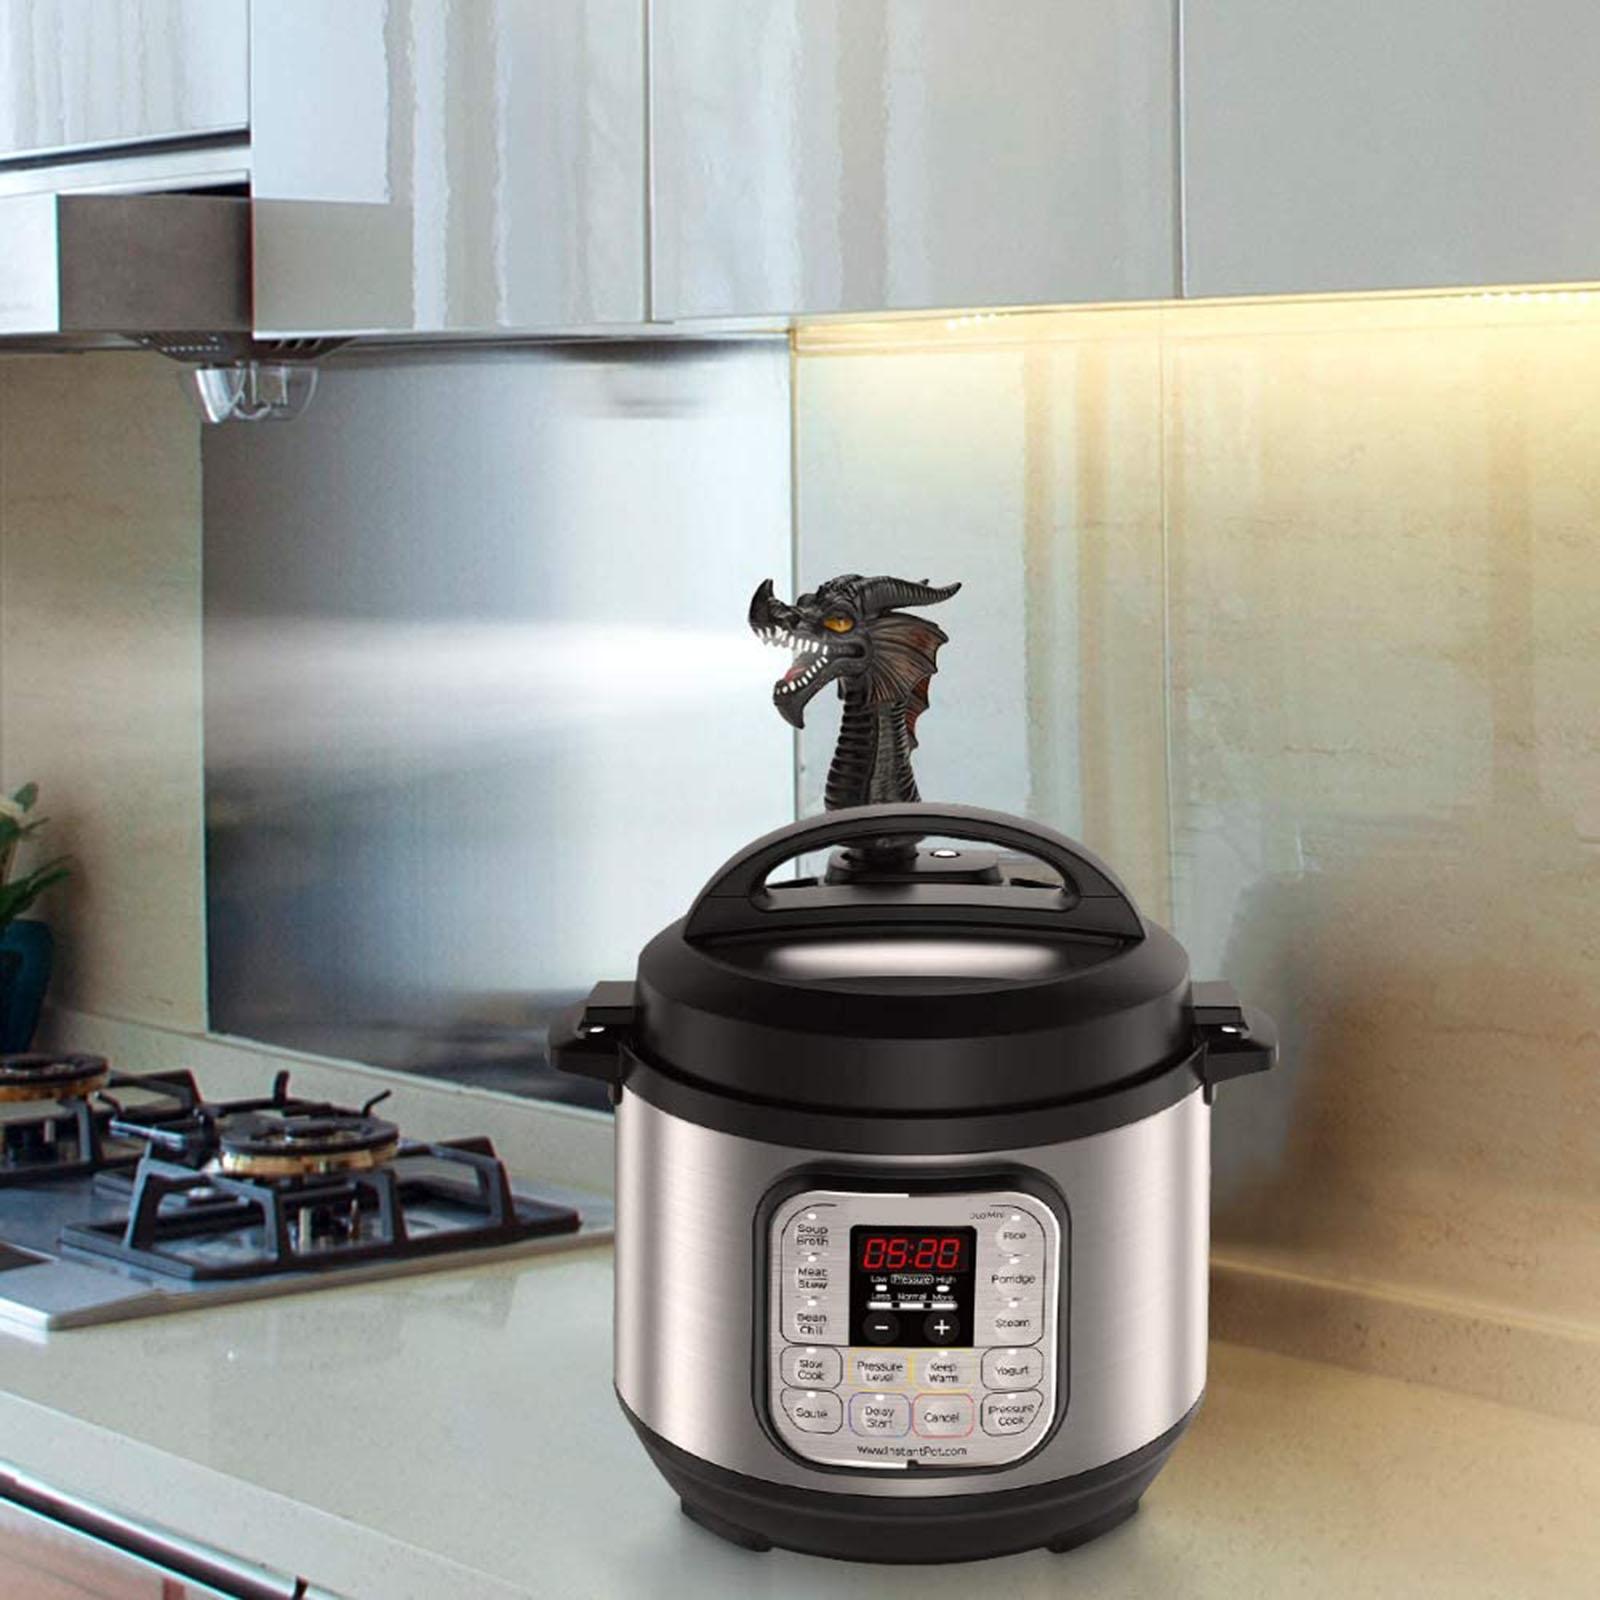 2PCS red Fire-Breathing Dragon Original Steam Release Accessory Steam Diverter for Pot Pressure Cooker Kitchen Supplies